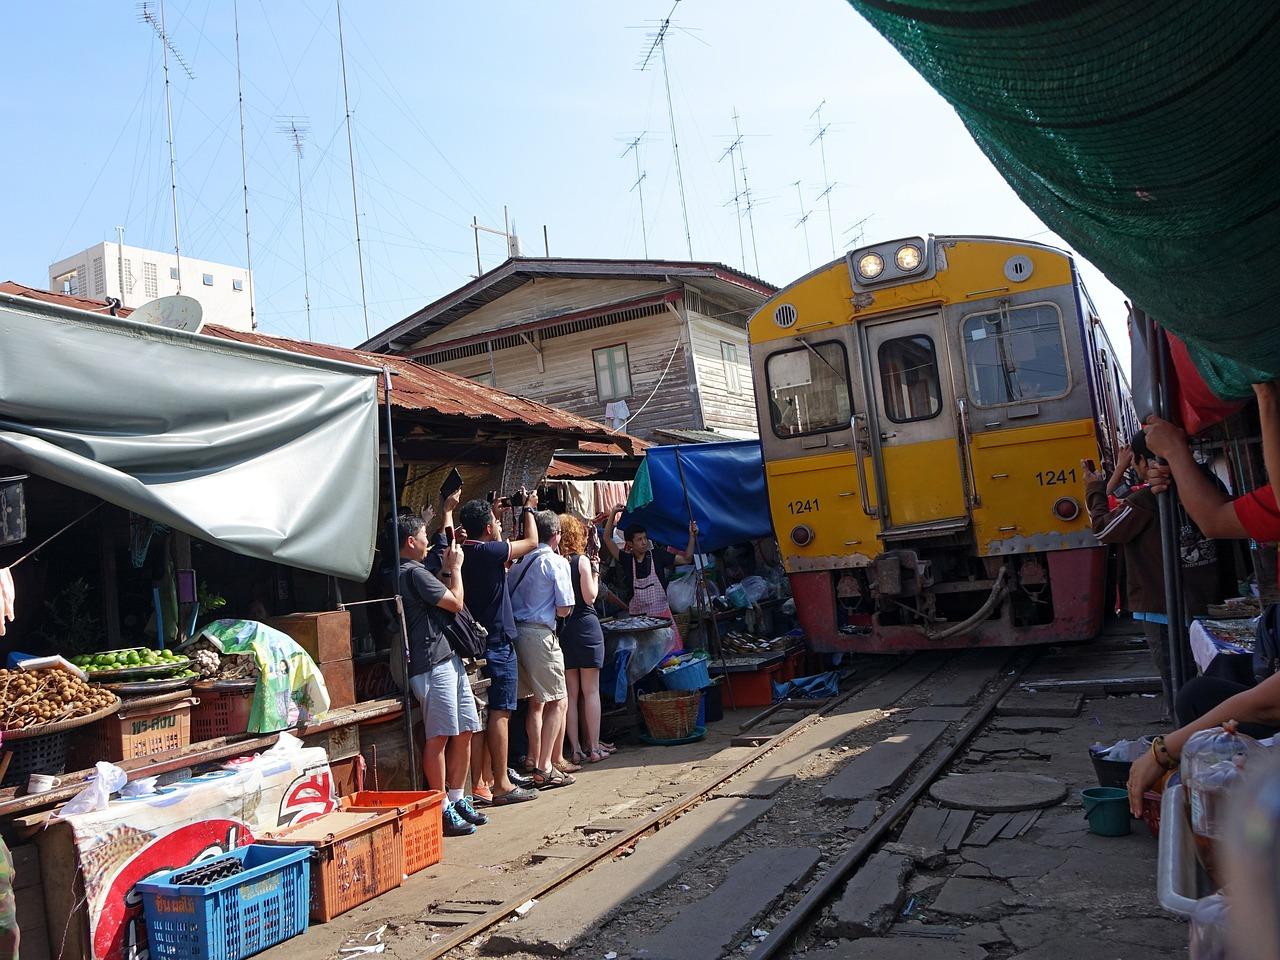 maeklong-railway-market-546290_1280